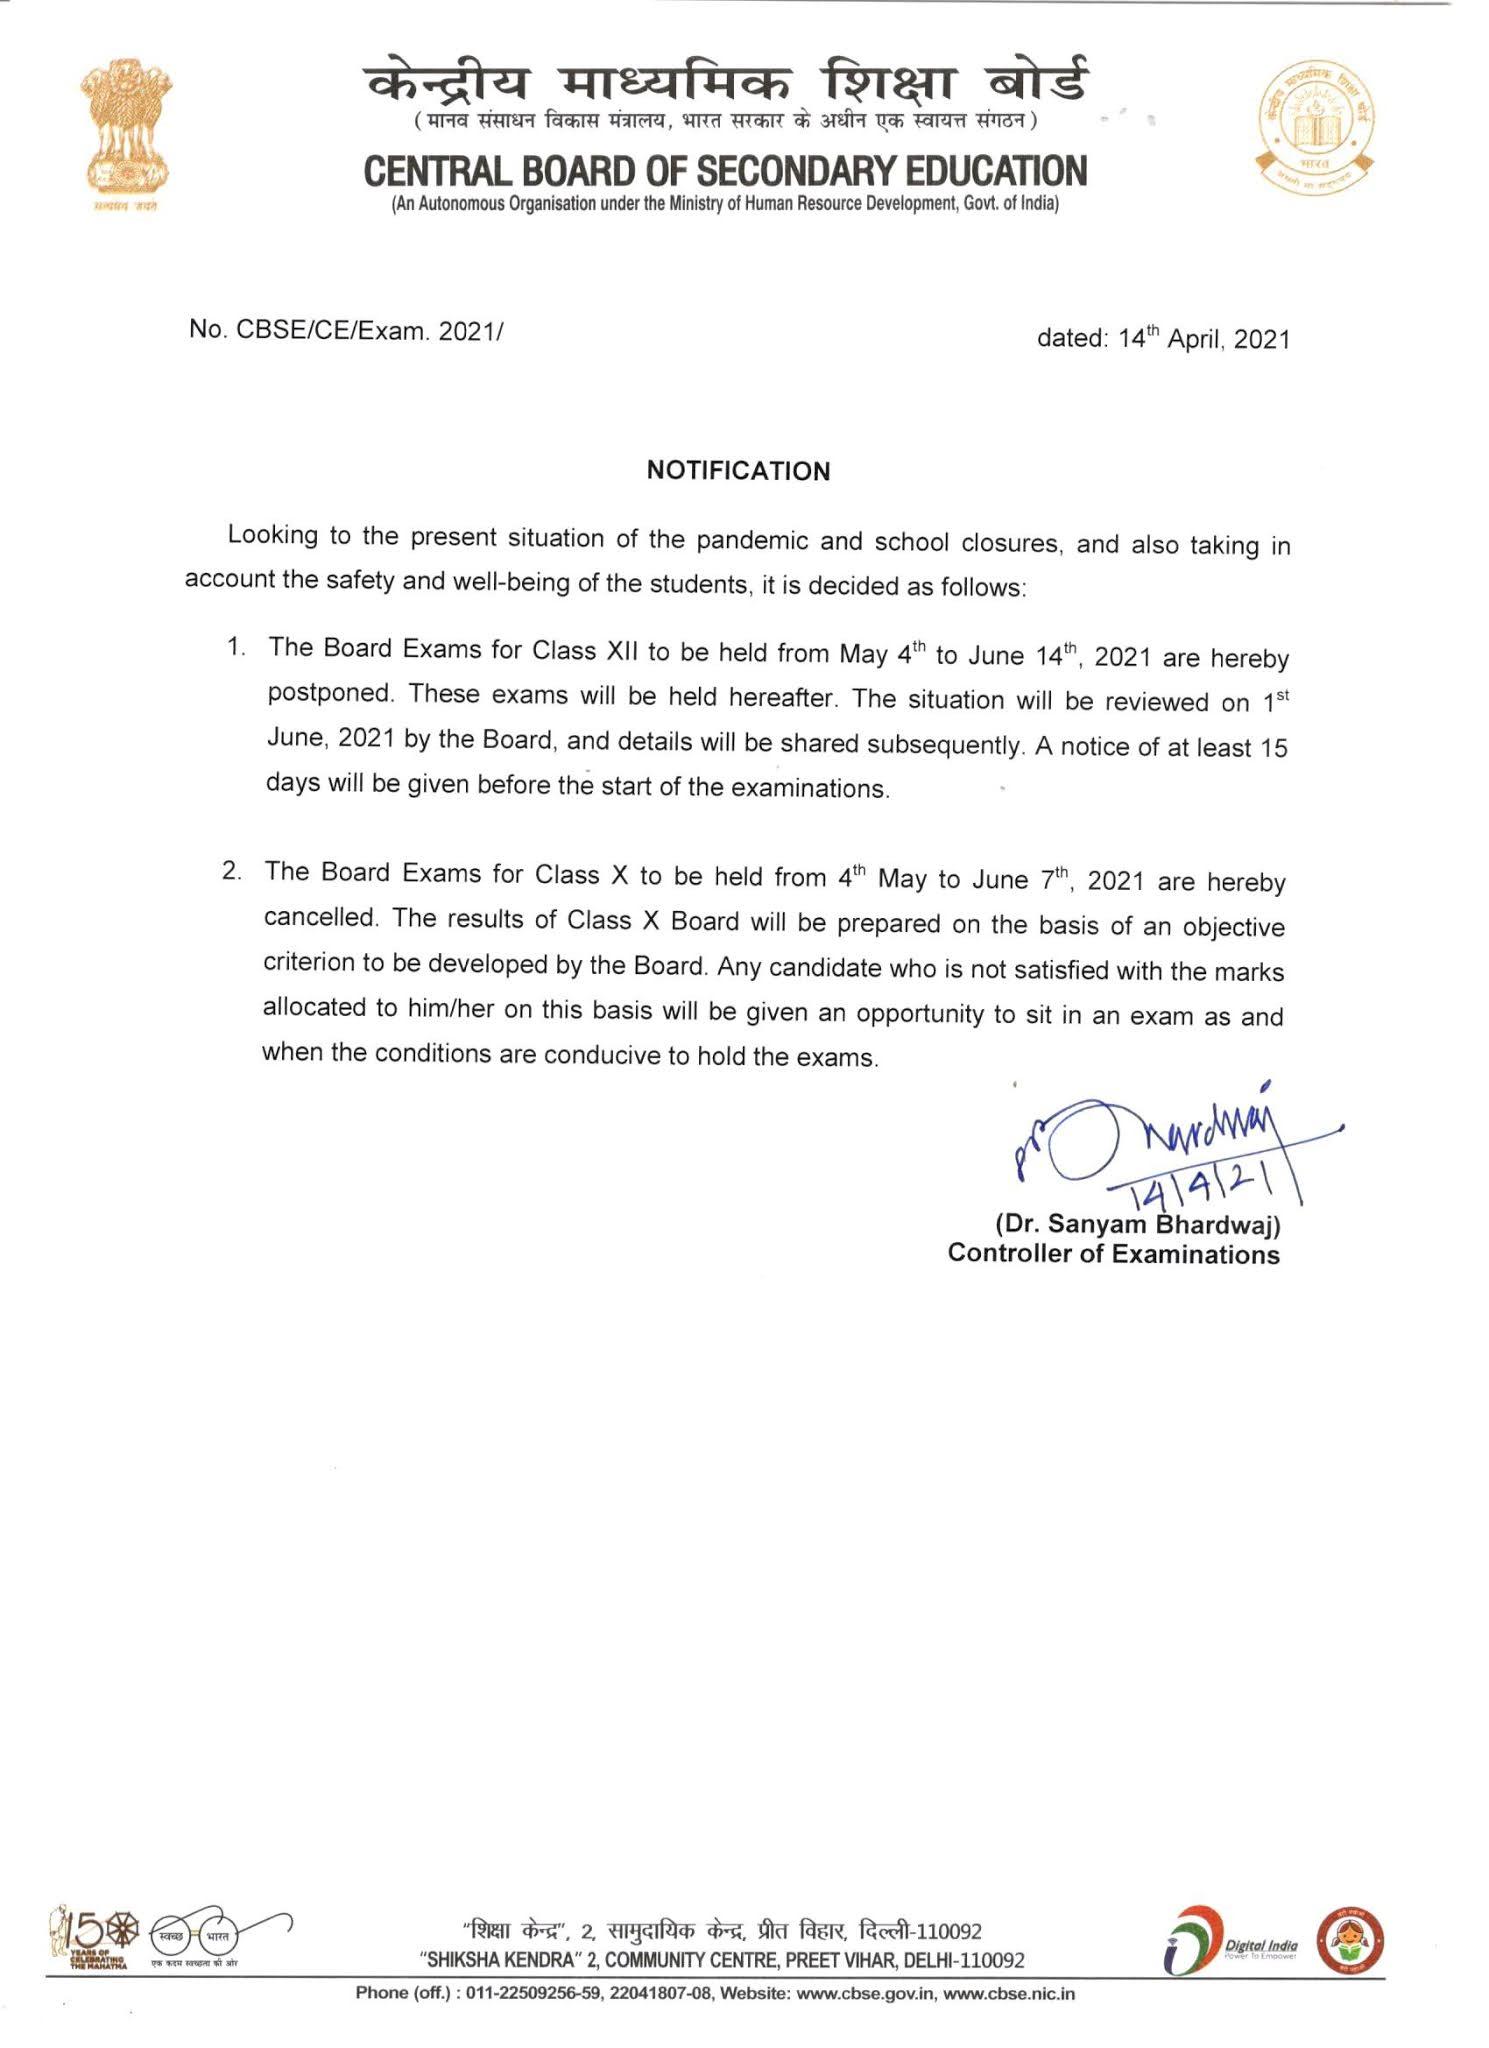 https://www.radhikainfotech.in/